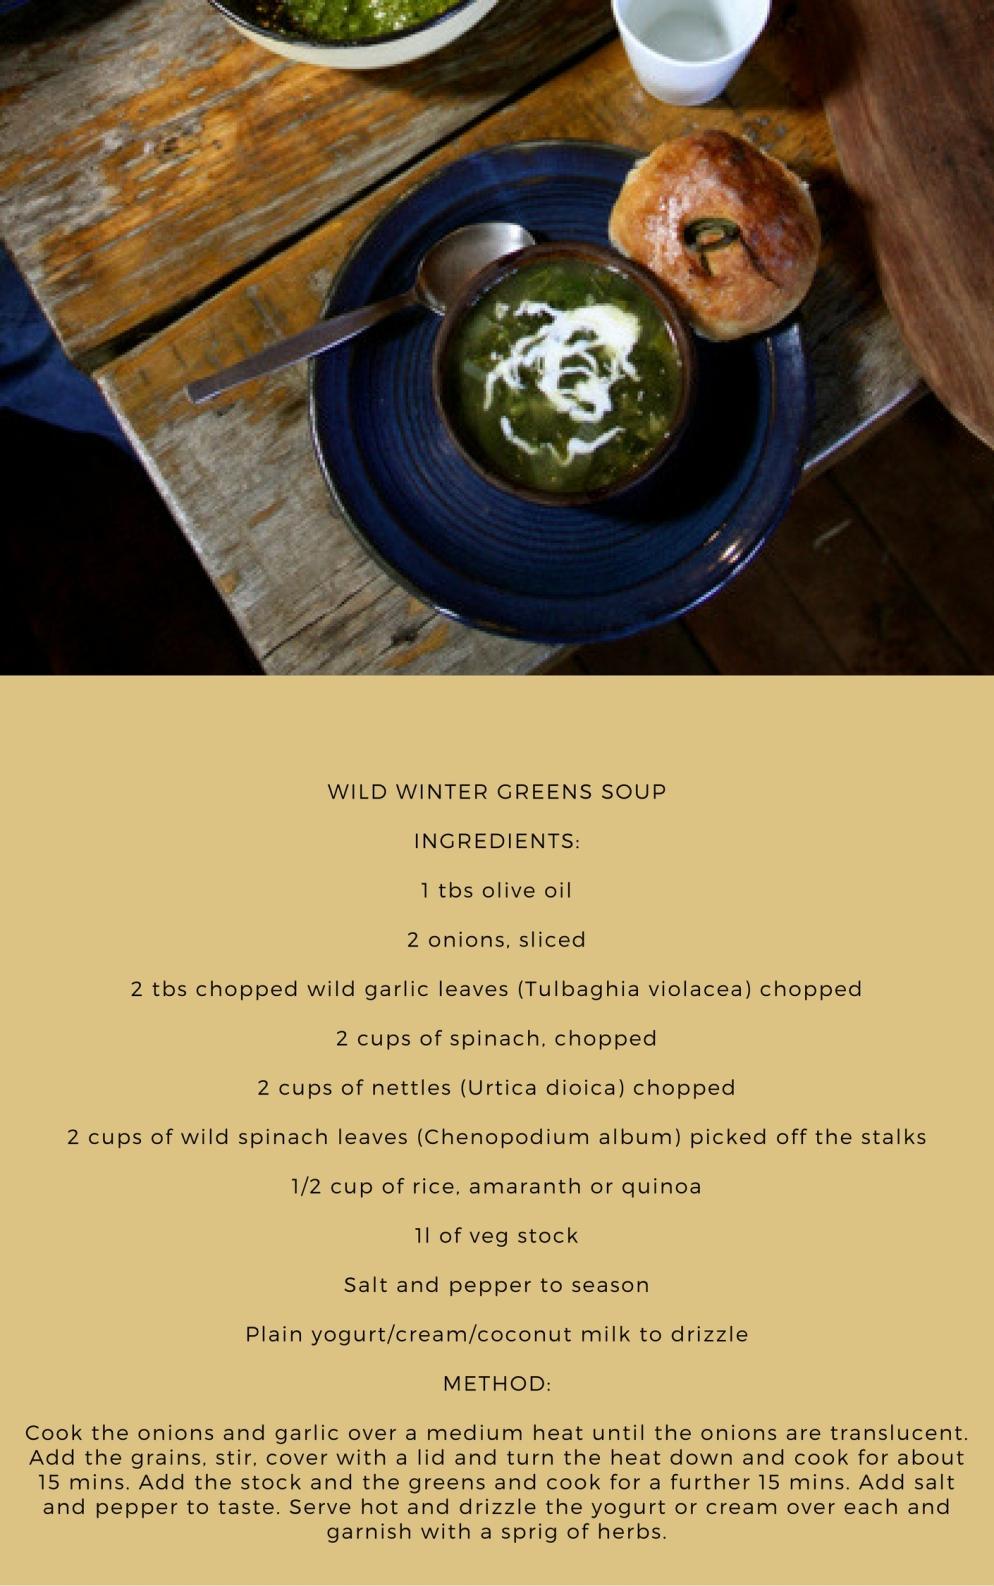 Wild Winter Greens Soup